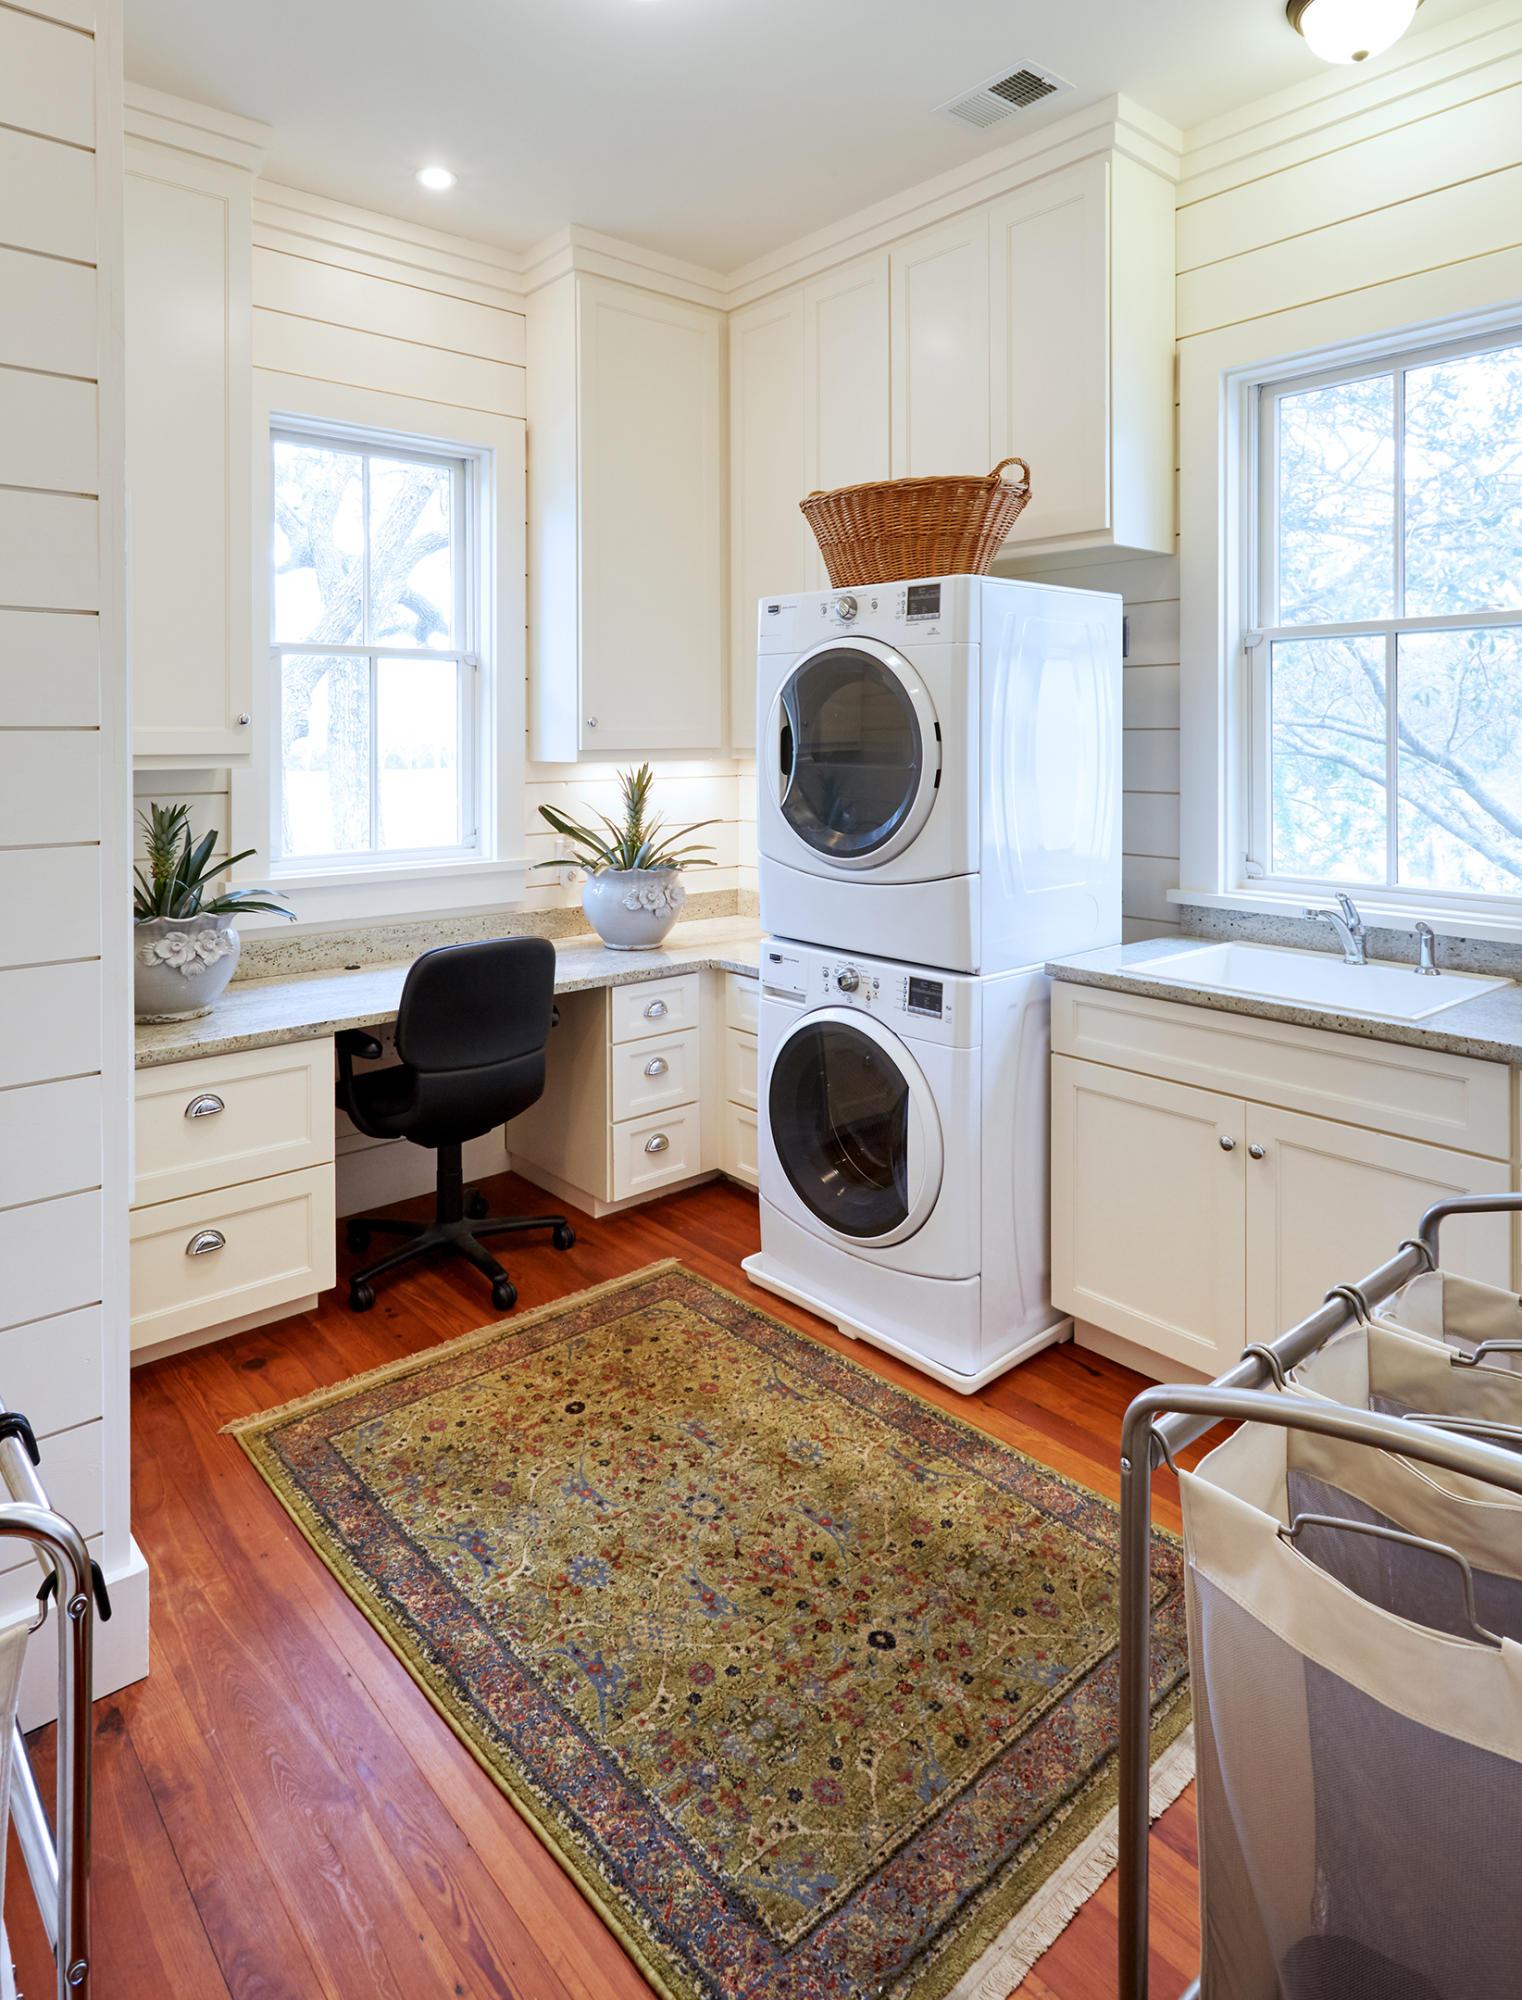 White Stalls Pt Jackson Homes For Sale - 625 Hall, Awendaw, SC - 26